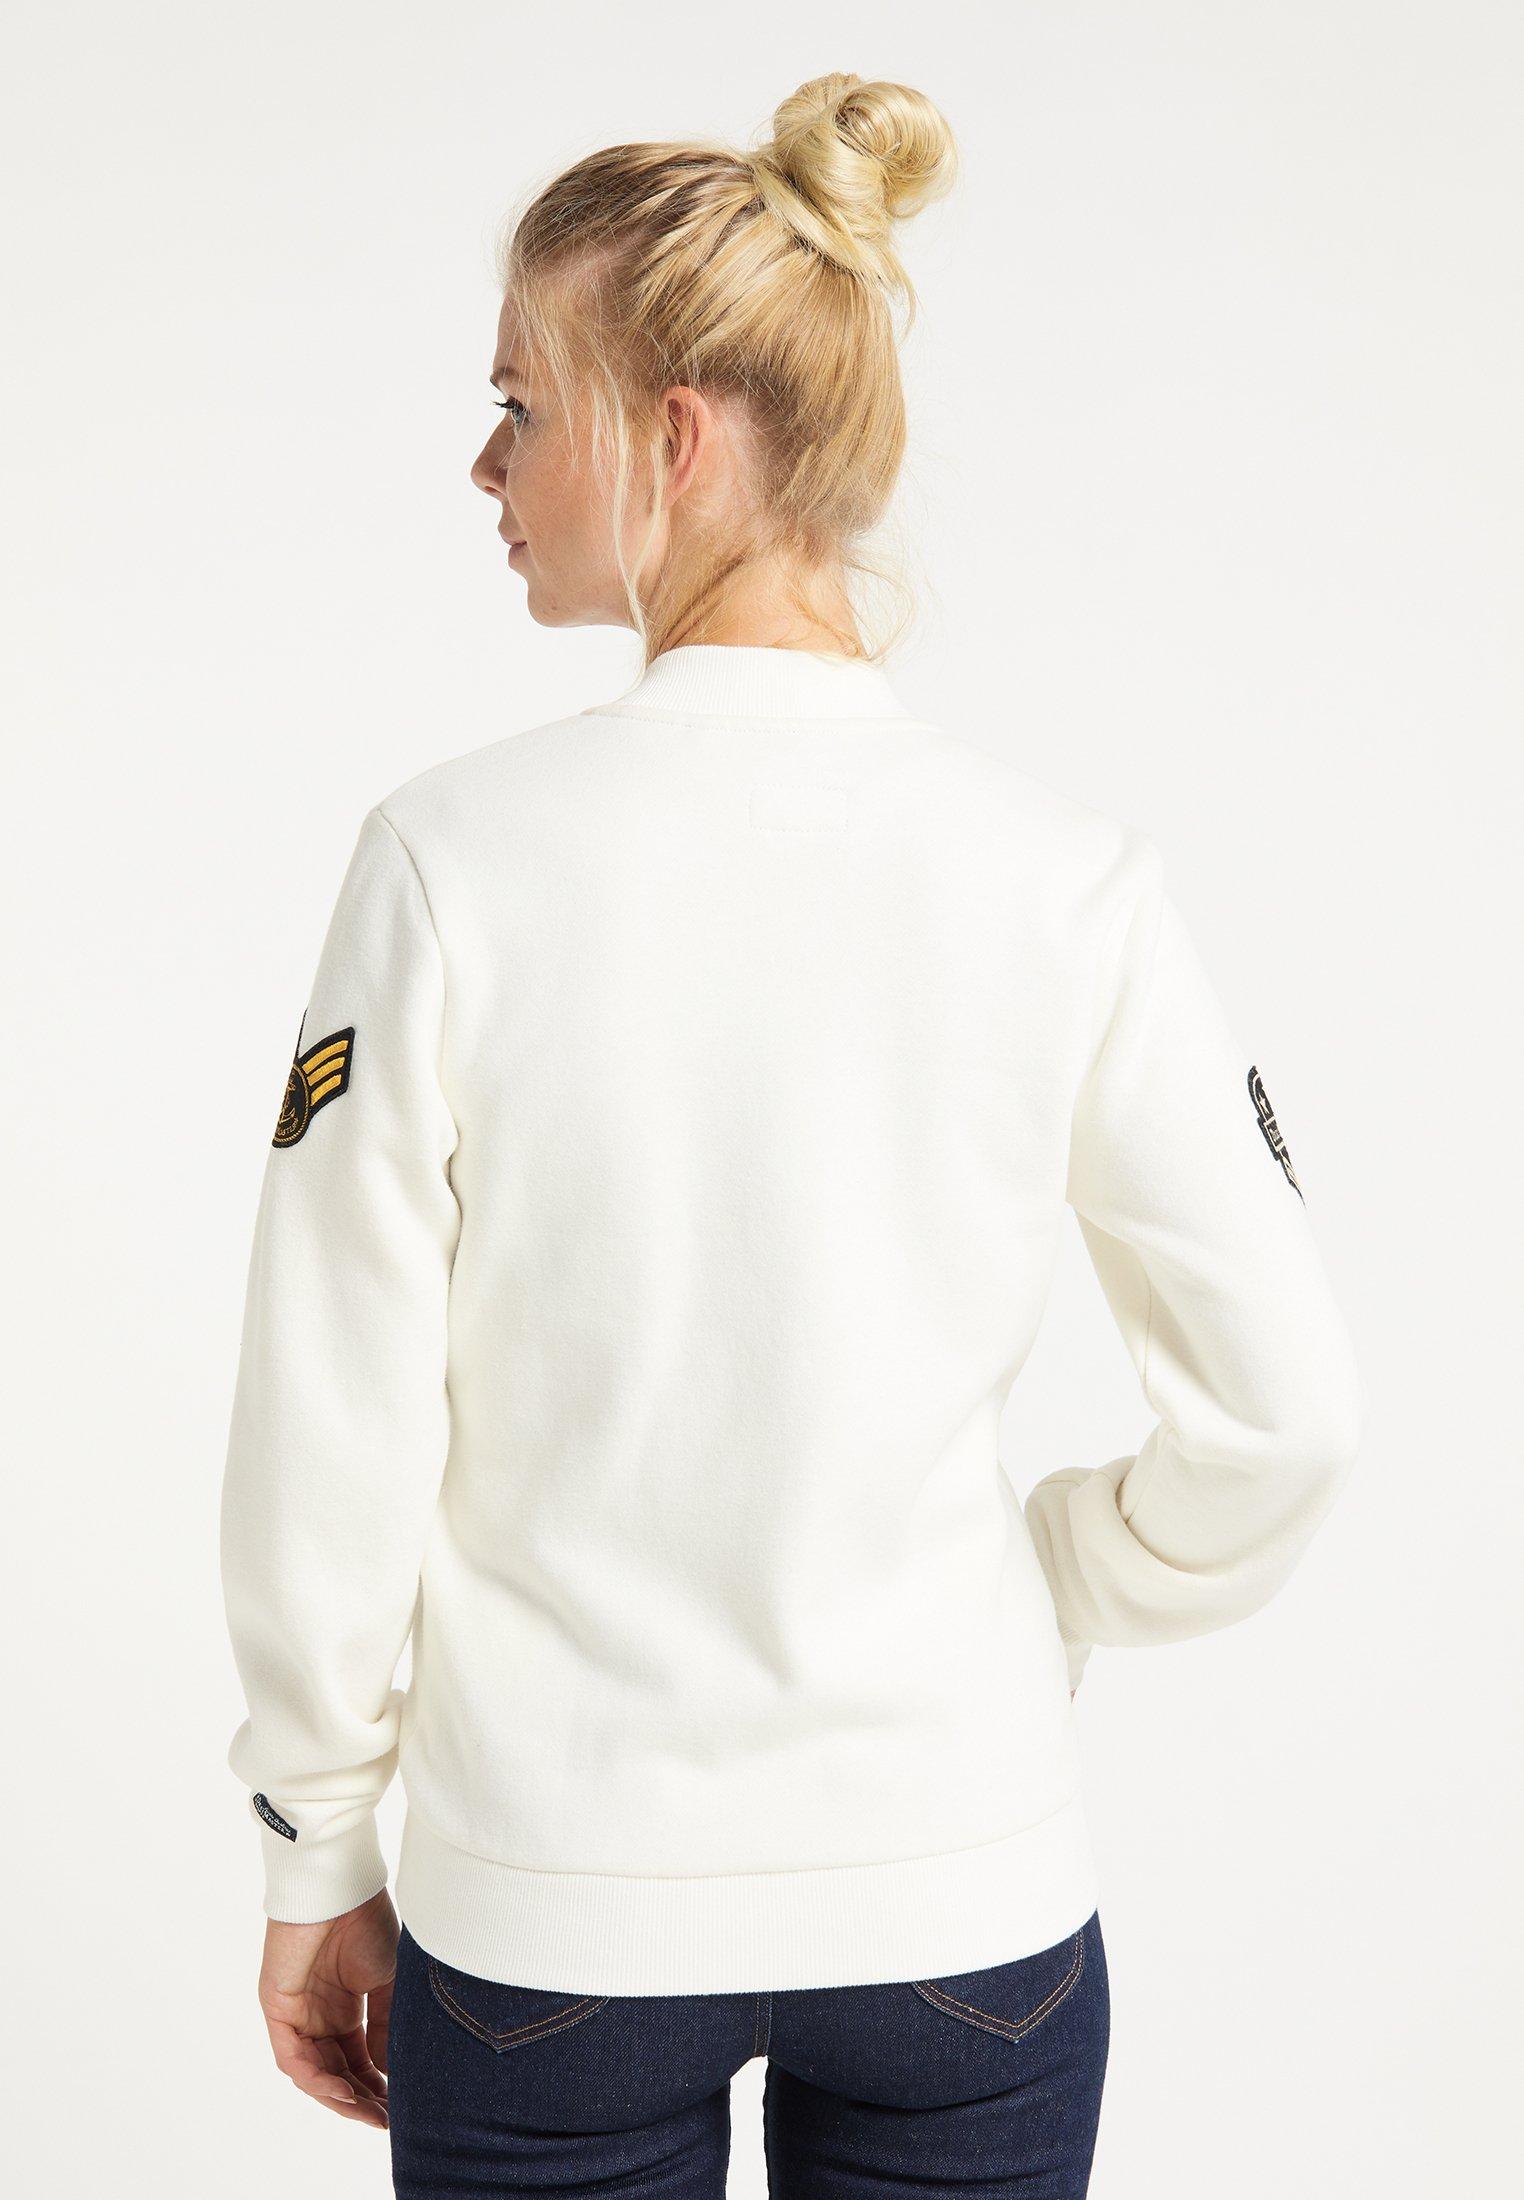 2020 New Women's Clothing DreiMaster Sweatshirt wollweiss AiCIReVRB